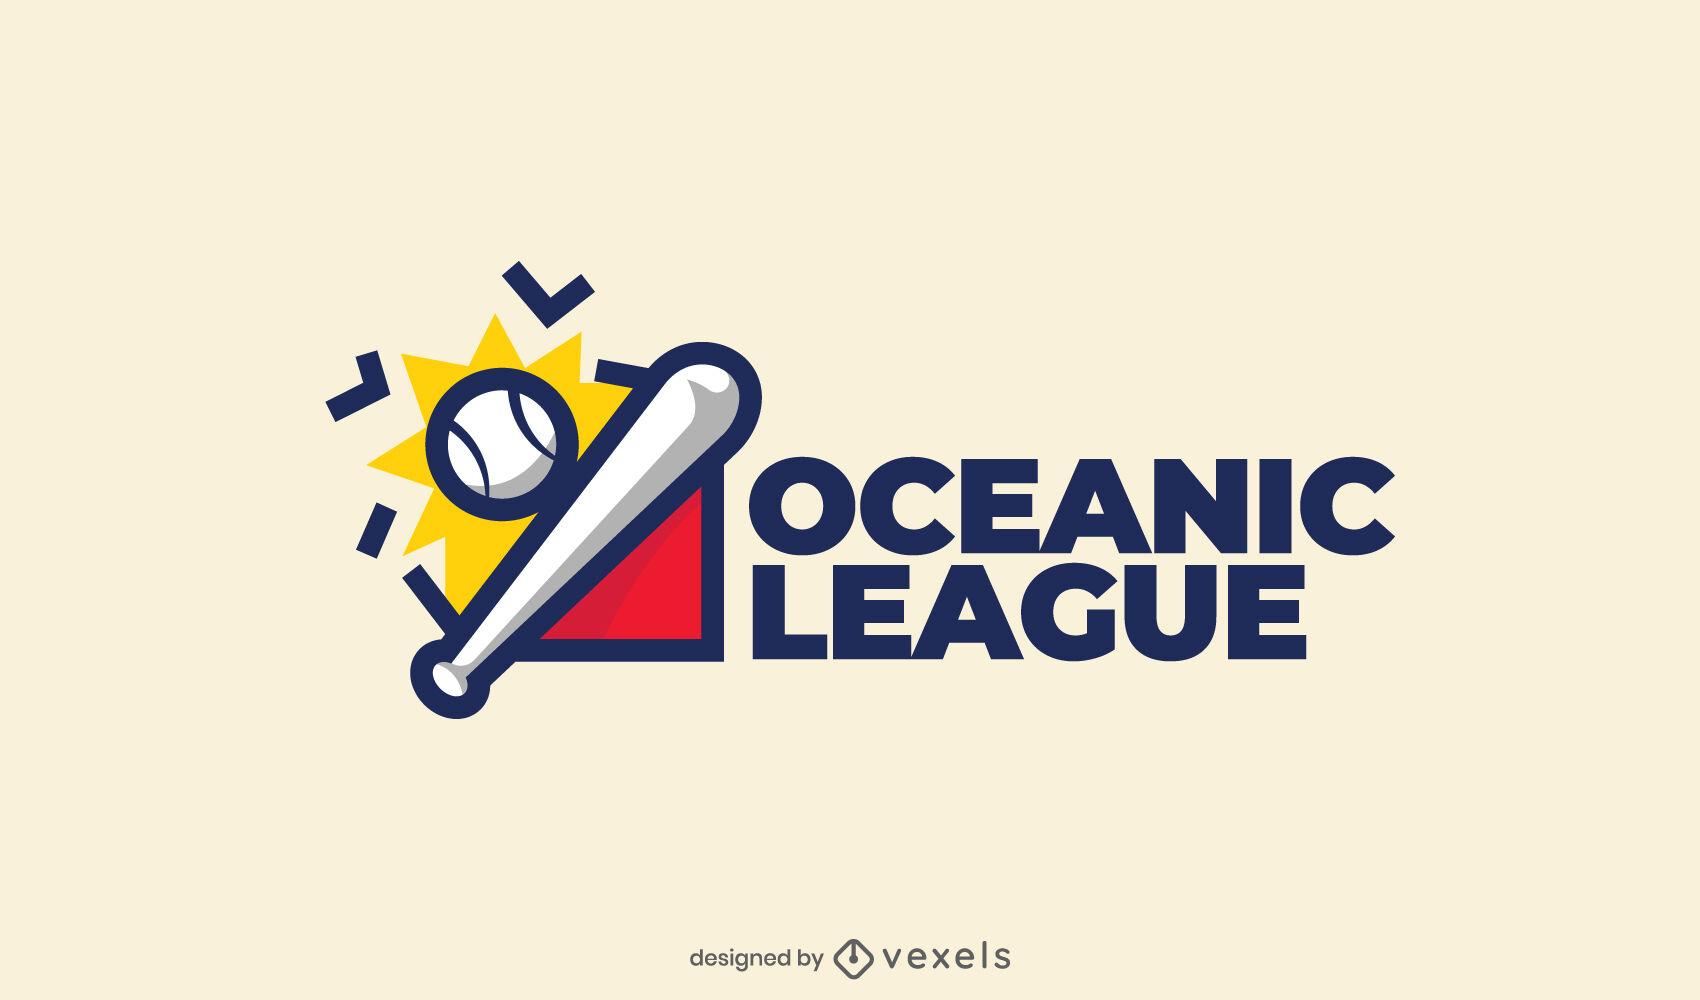 Baseball-Farbstrich-Logo-Design